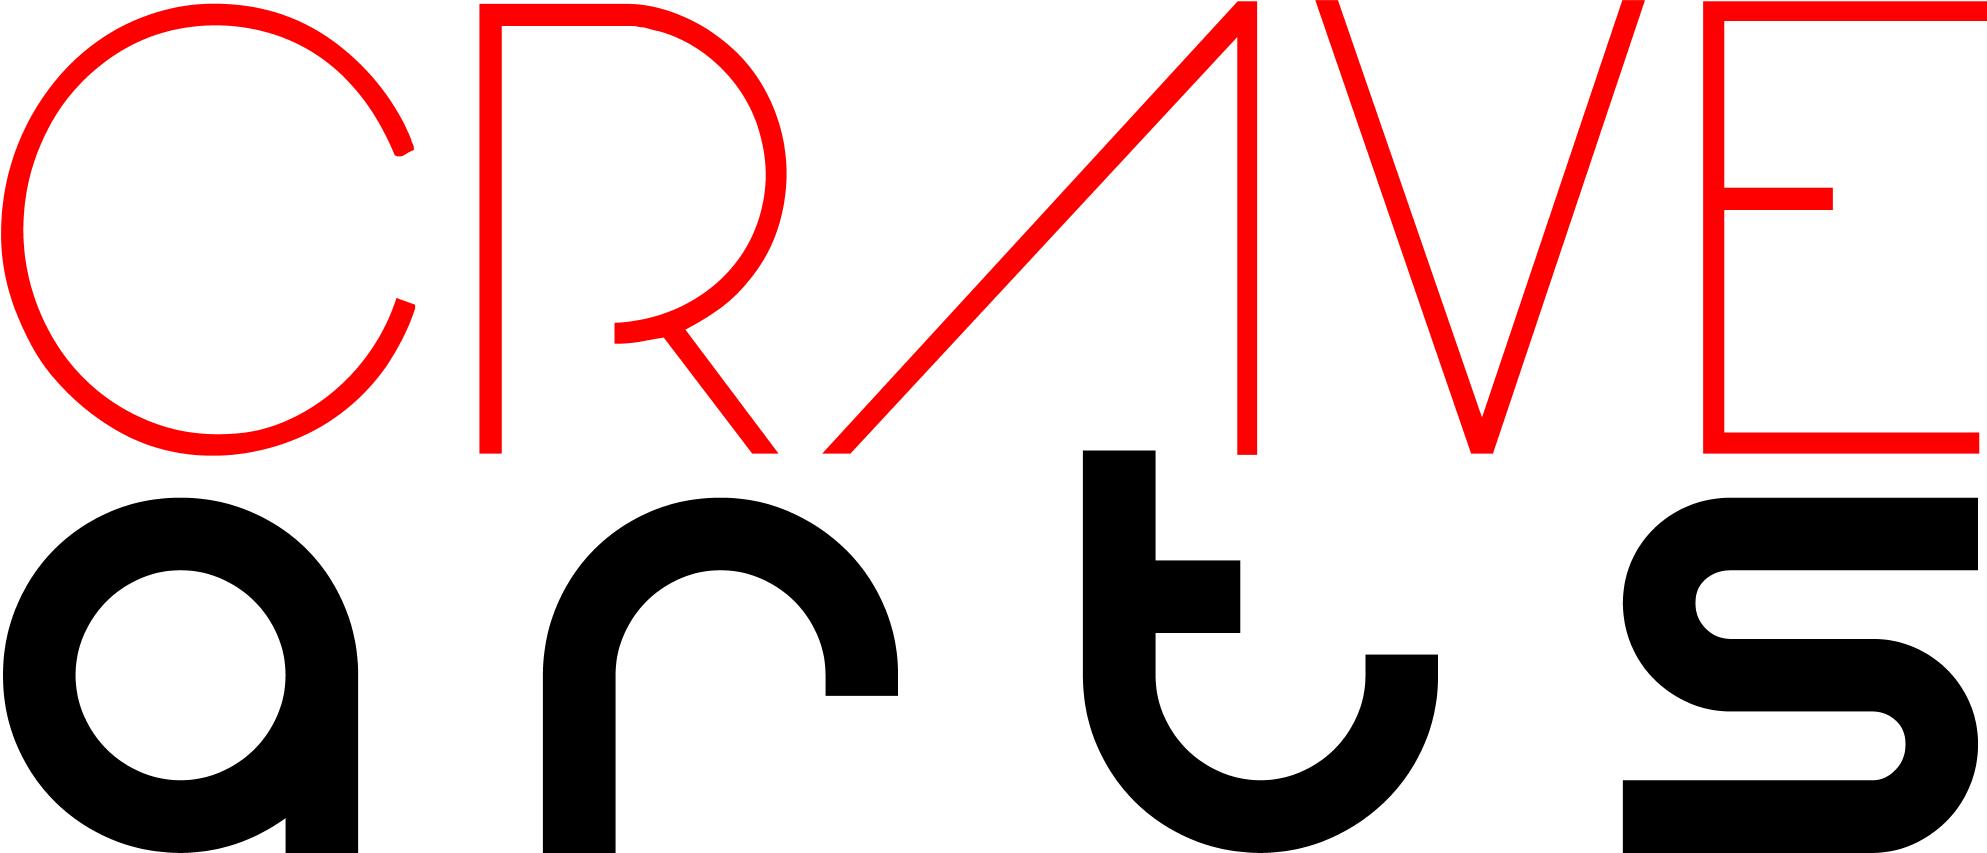 Crave Arts Logo Small.png